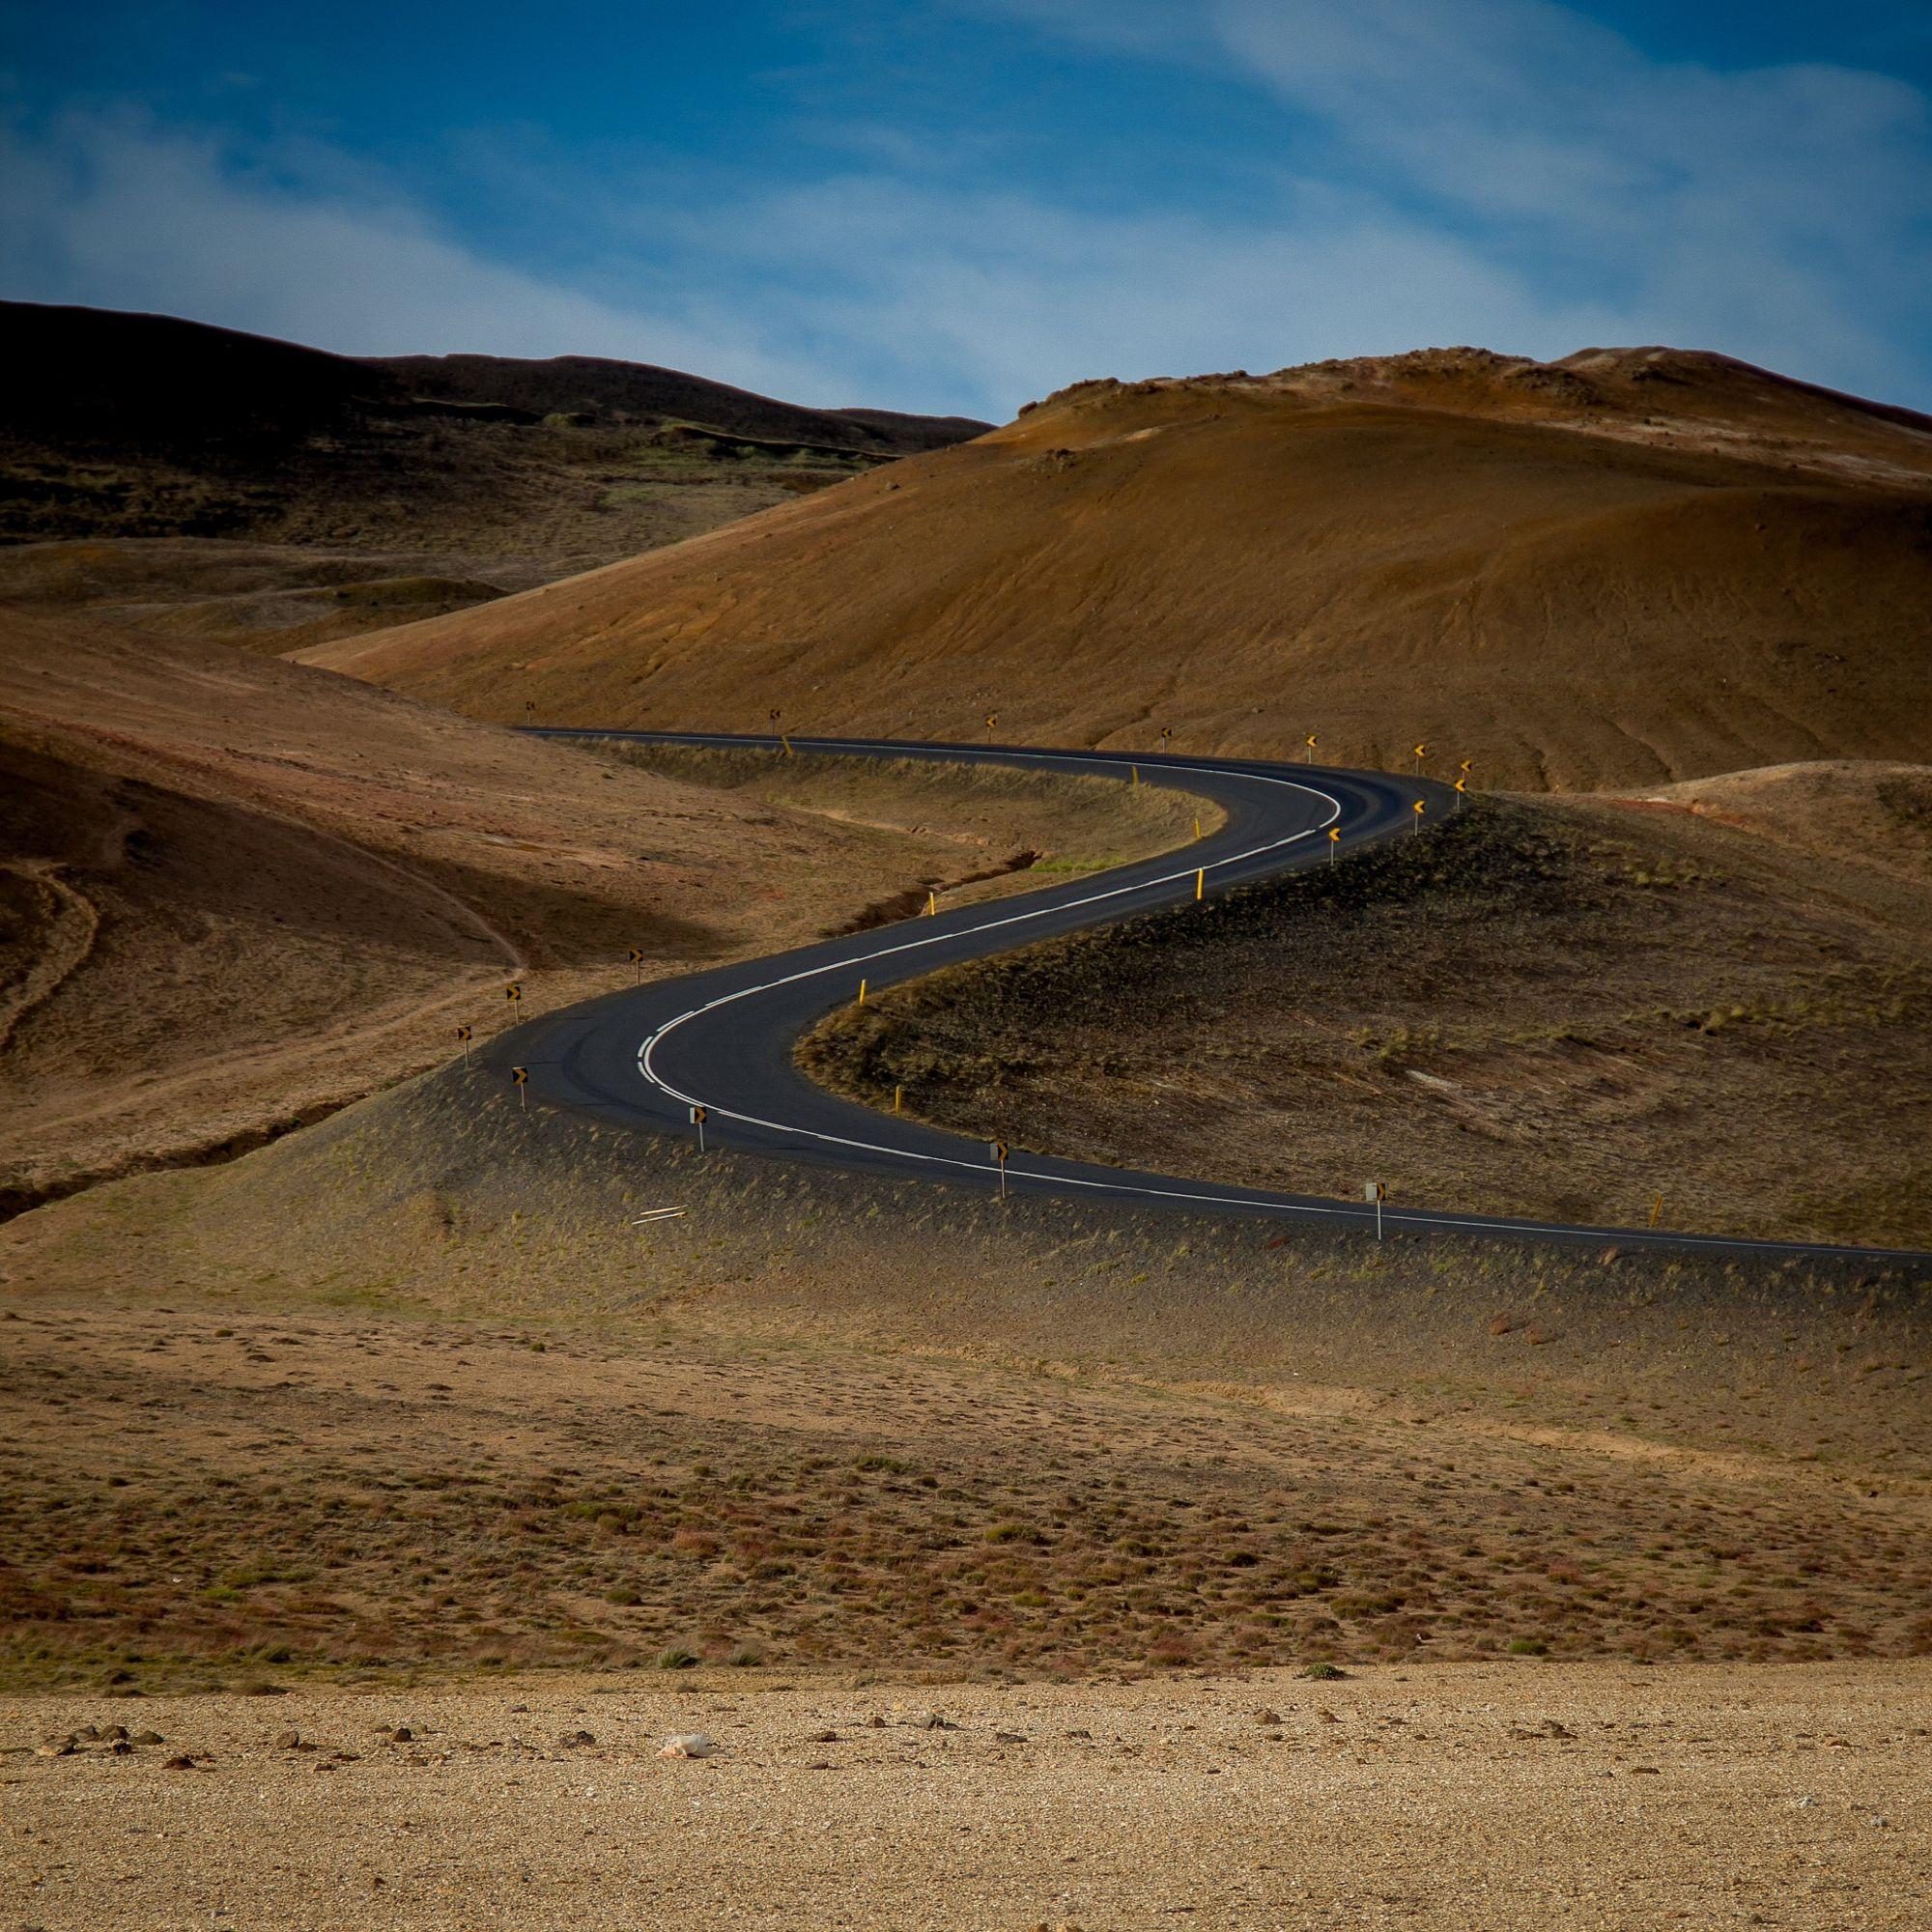 S-Road  Travel photo by emilien_gigandet http://rarme.com/?F9gZi